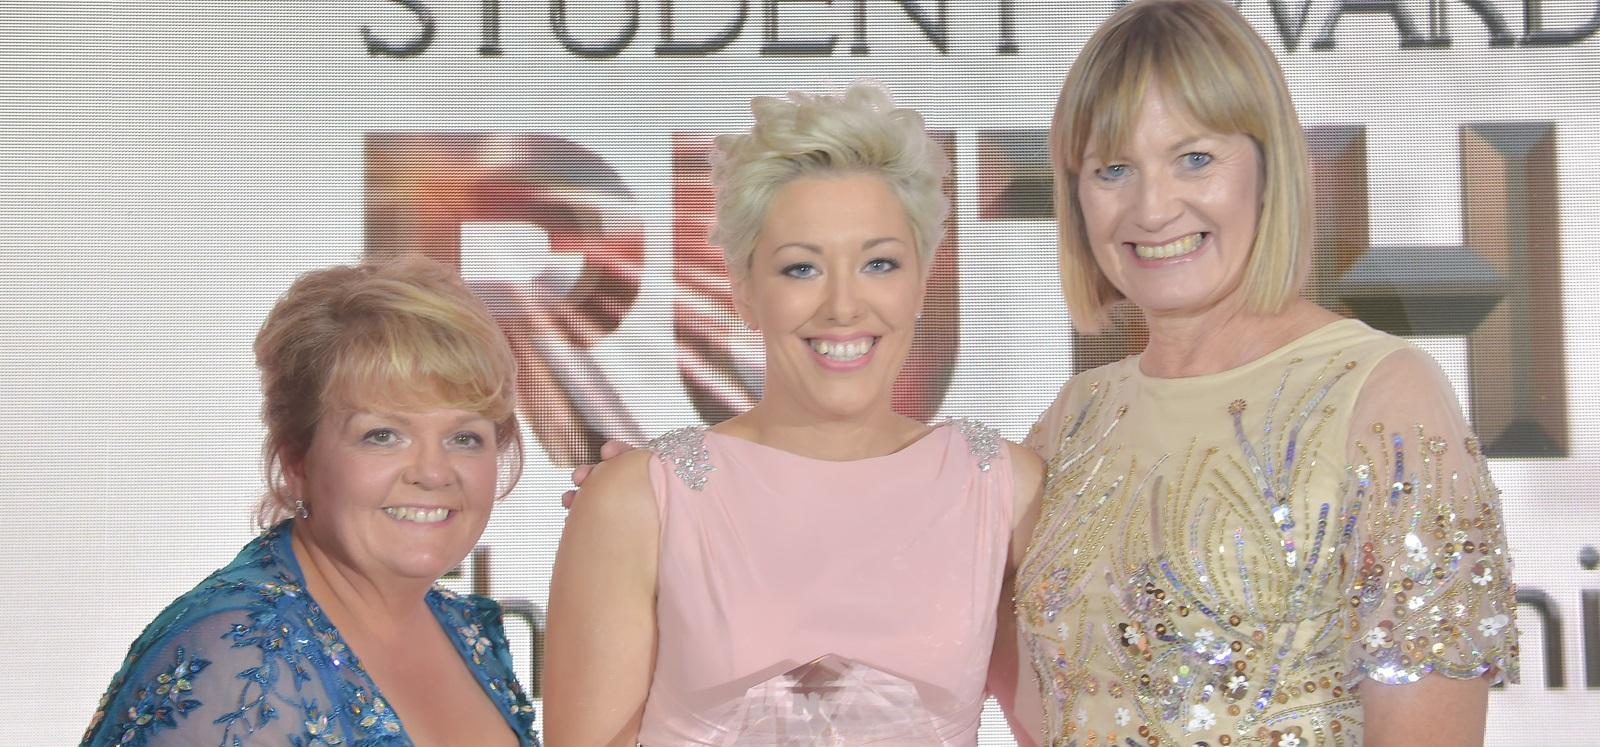 News Student Award School Of Nursing And Midwifery